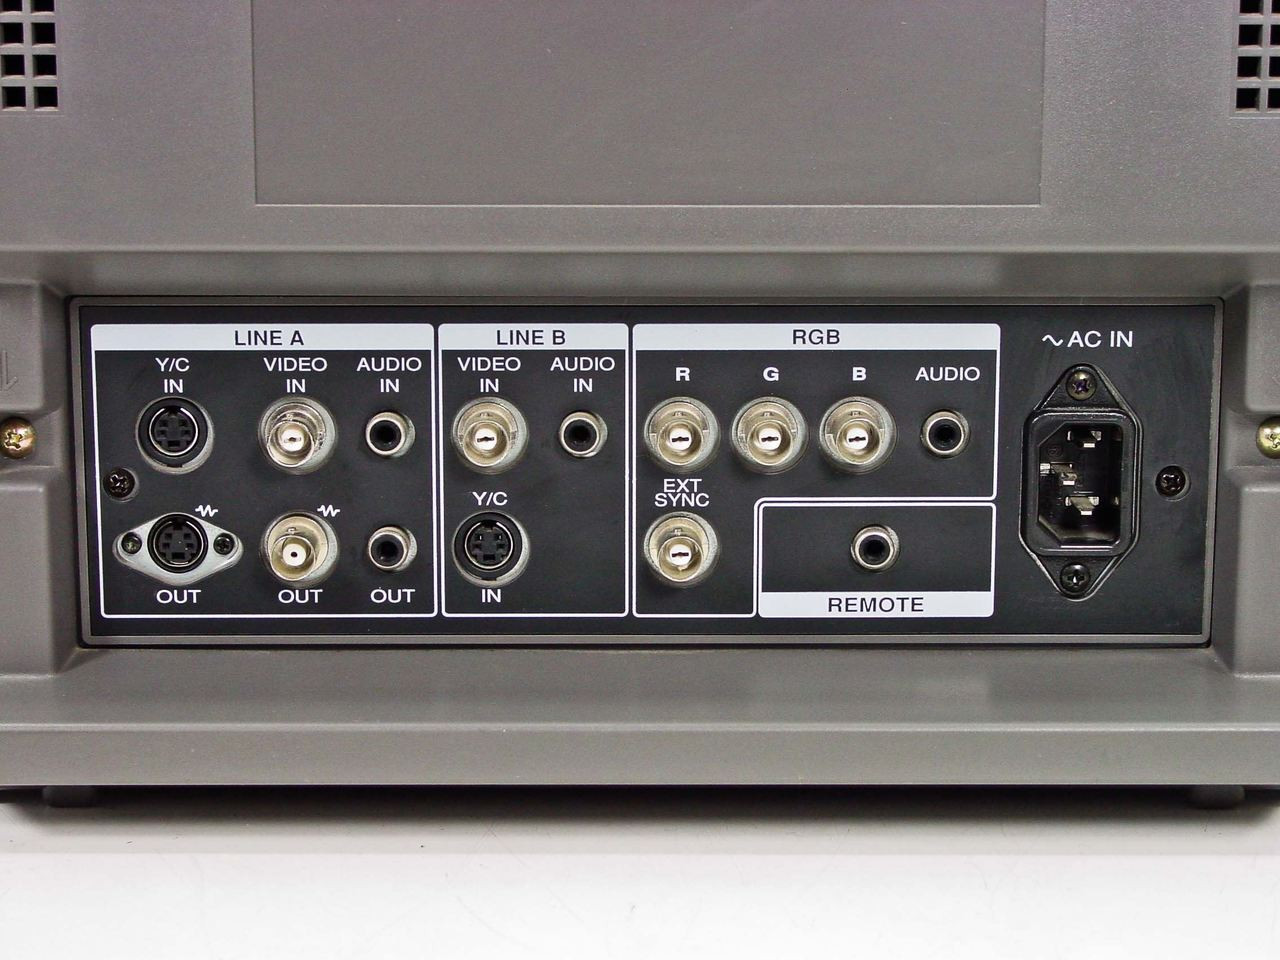 sony-pvm-14n6u-14-trinitron-color-video-monitor-5.39__04969.1490121492.jpg